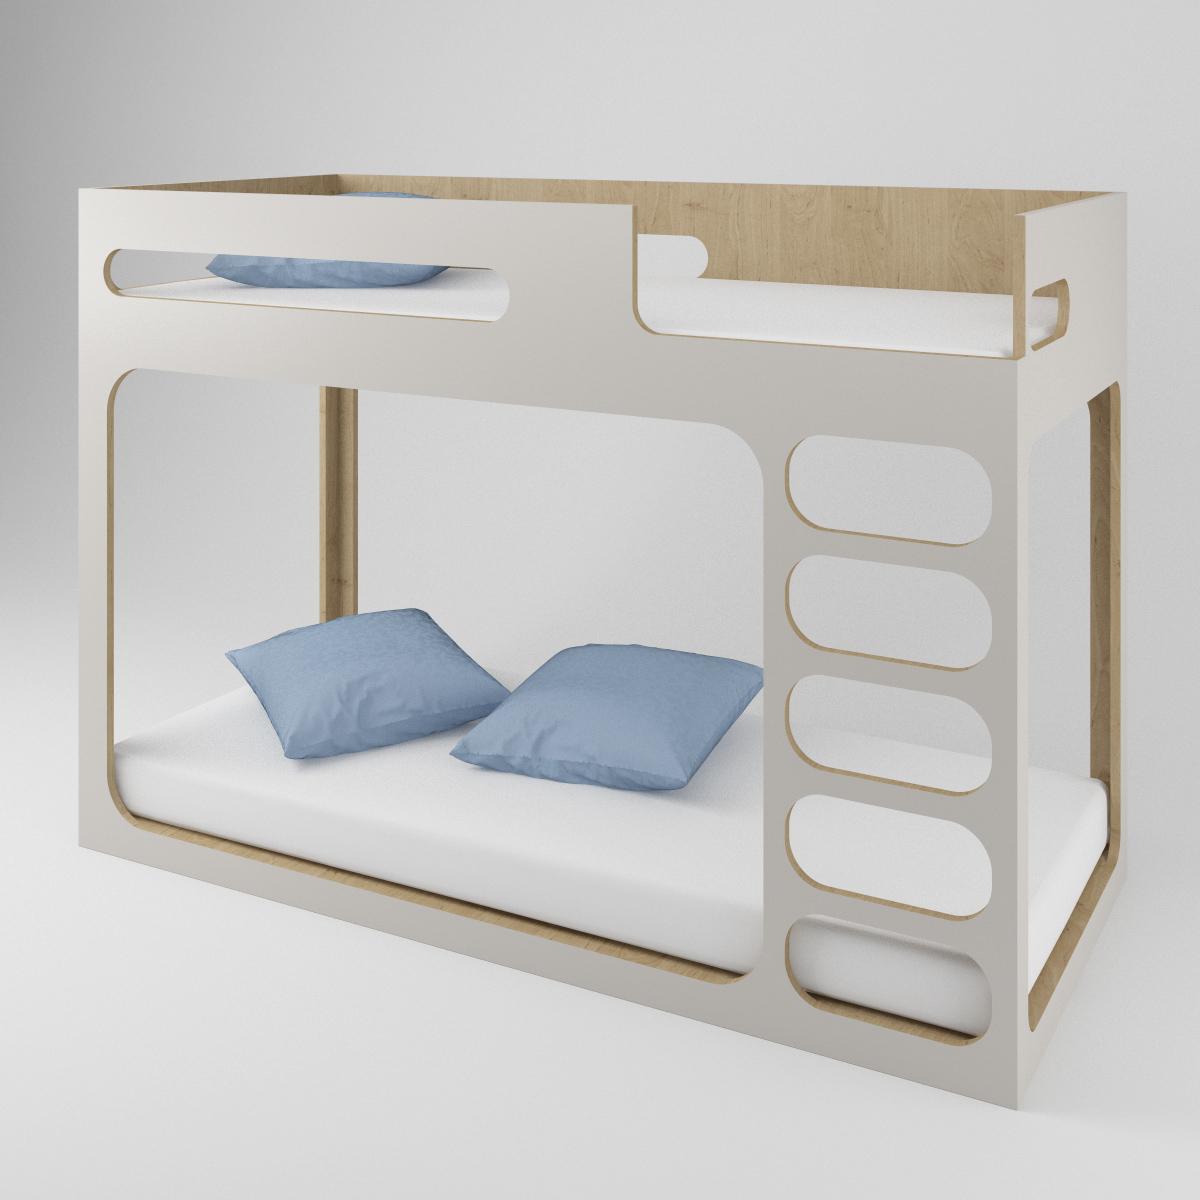 Perludi Bed for children - bunk bed - modern - Hochbett